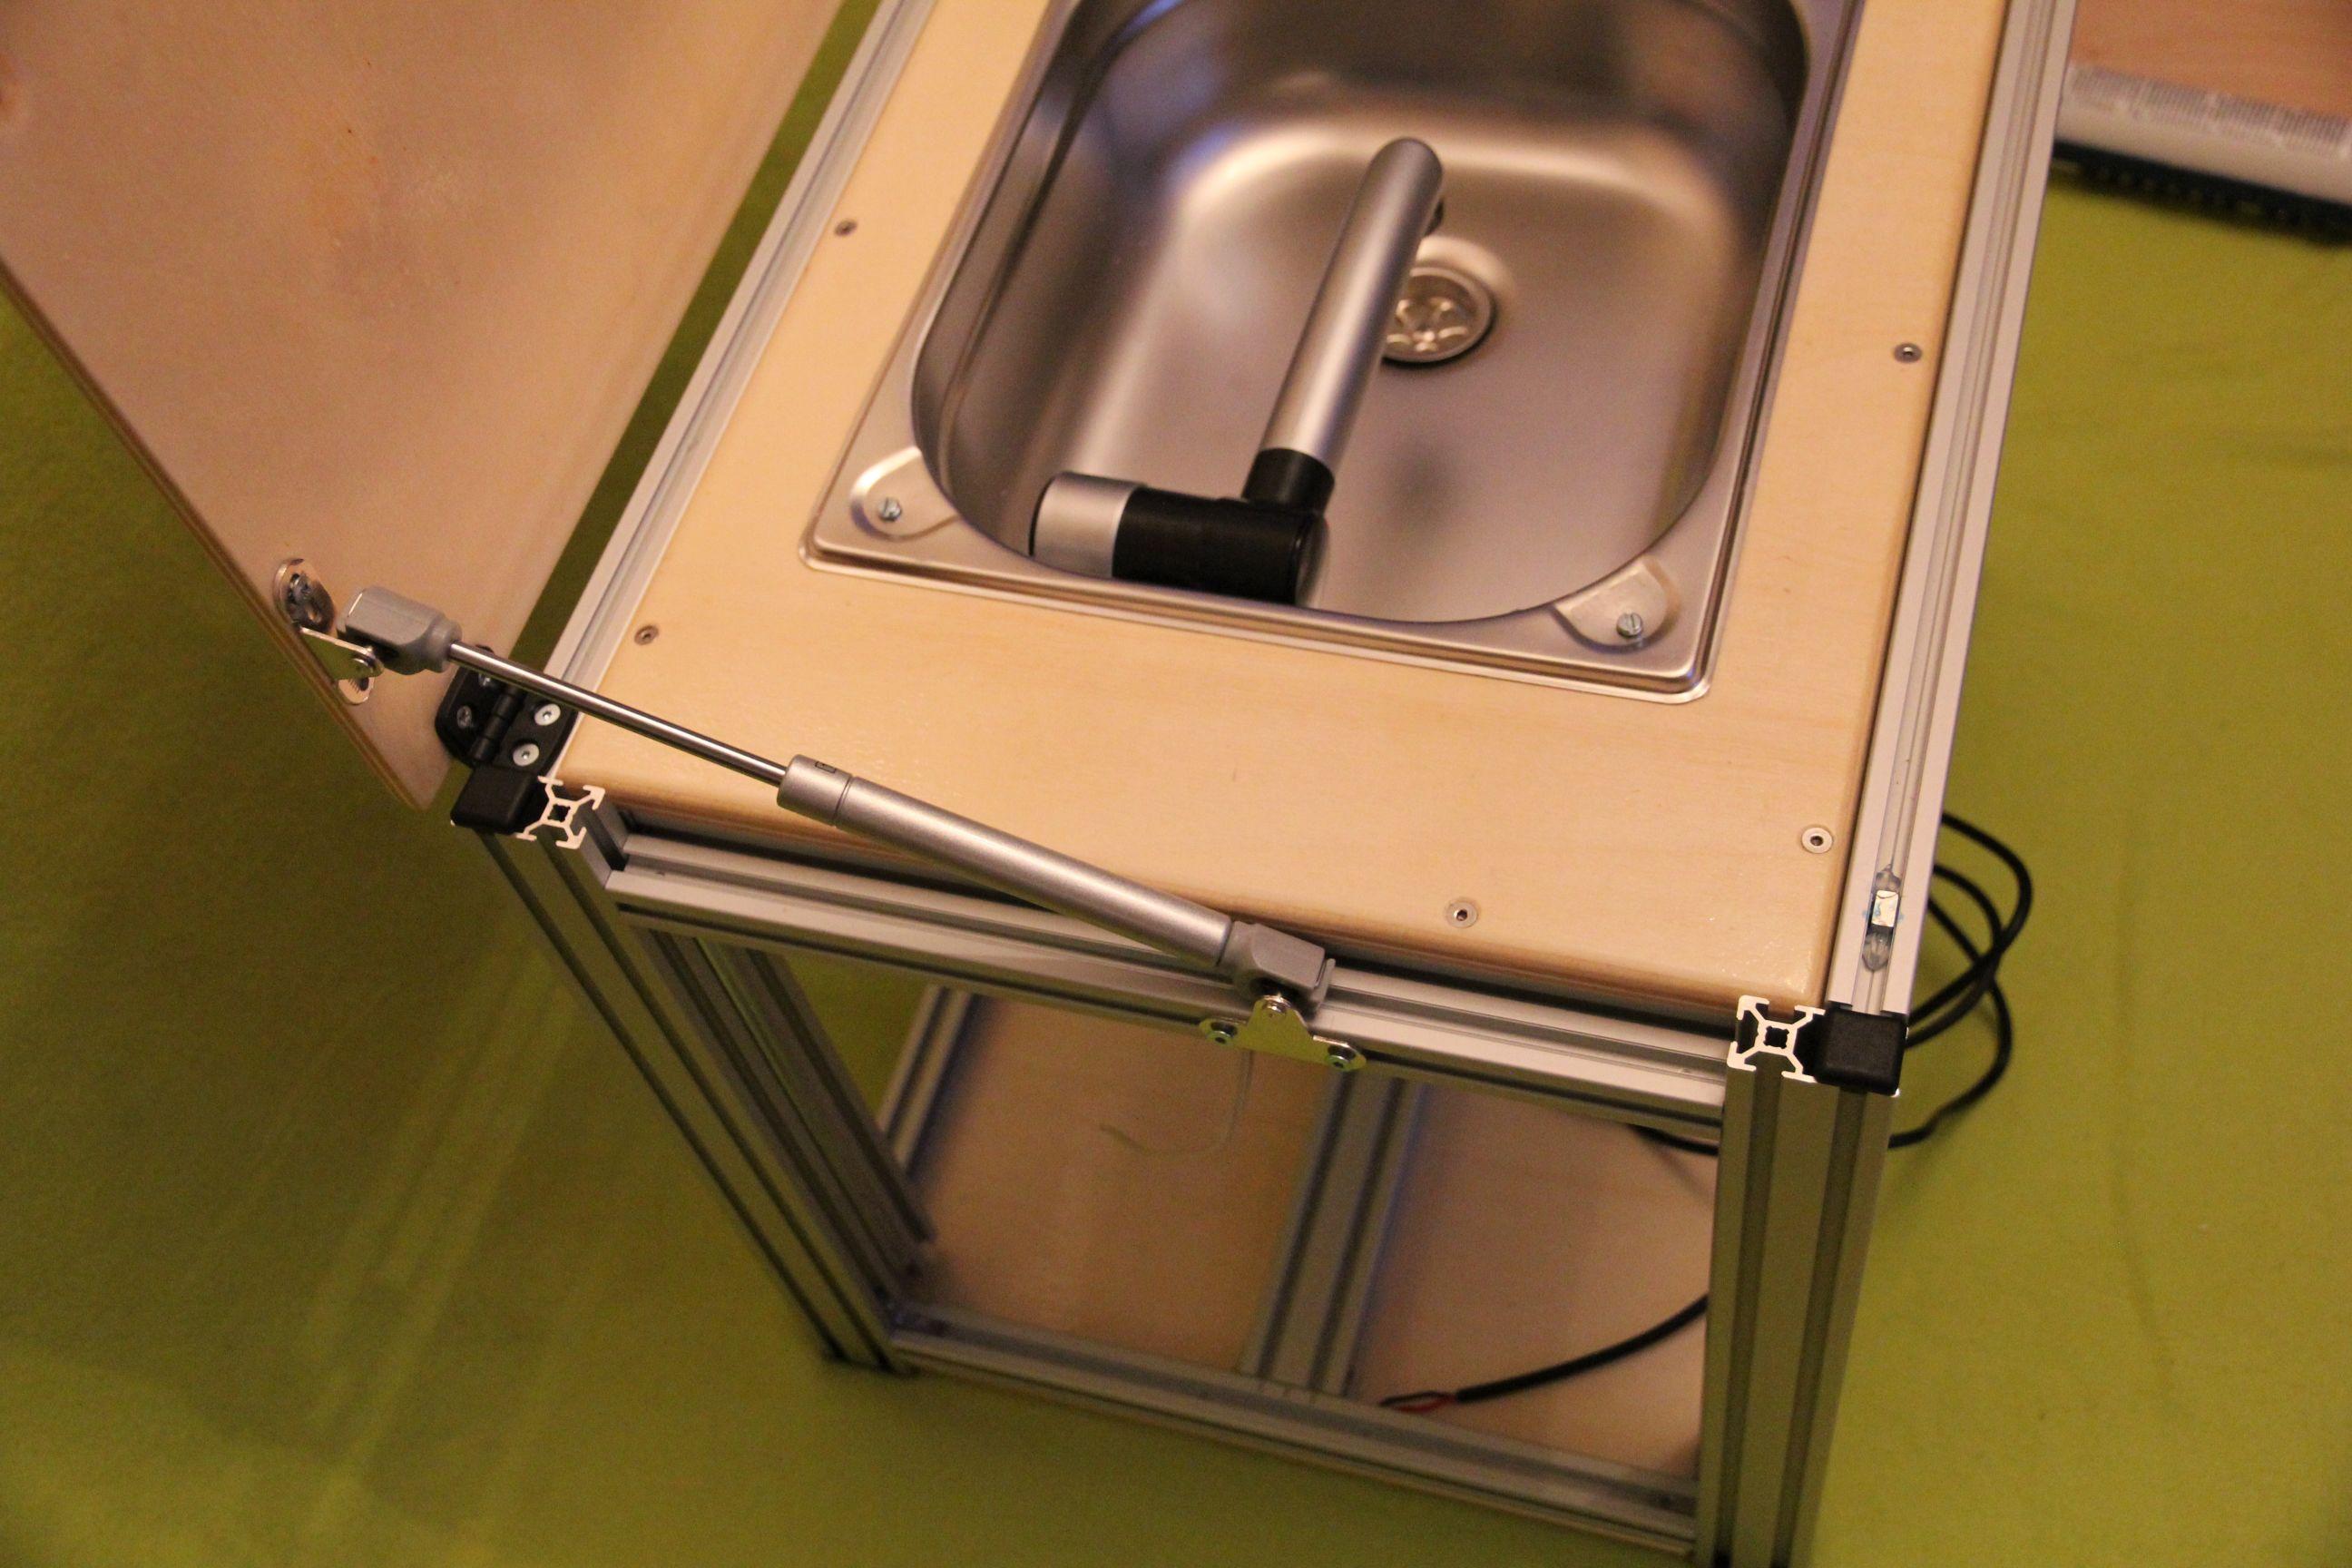 Camping küchenblock selber bauen  Ultrakompakt-Waschbecken-Modul, die Selbstbau-Anregung